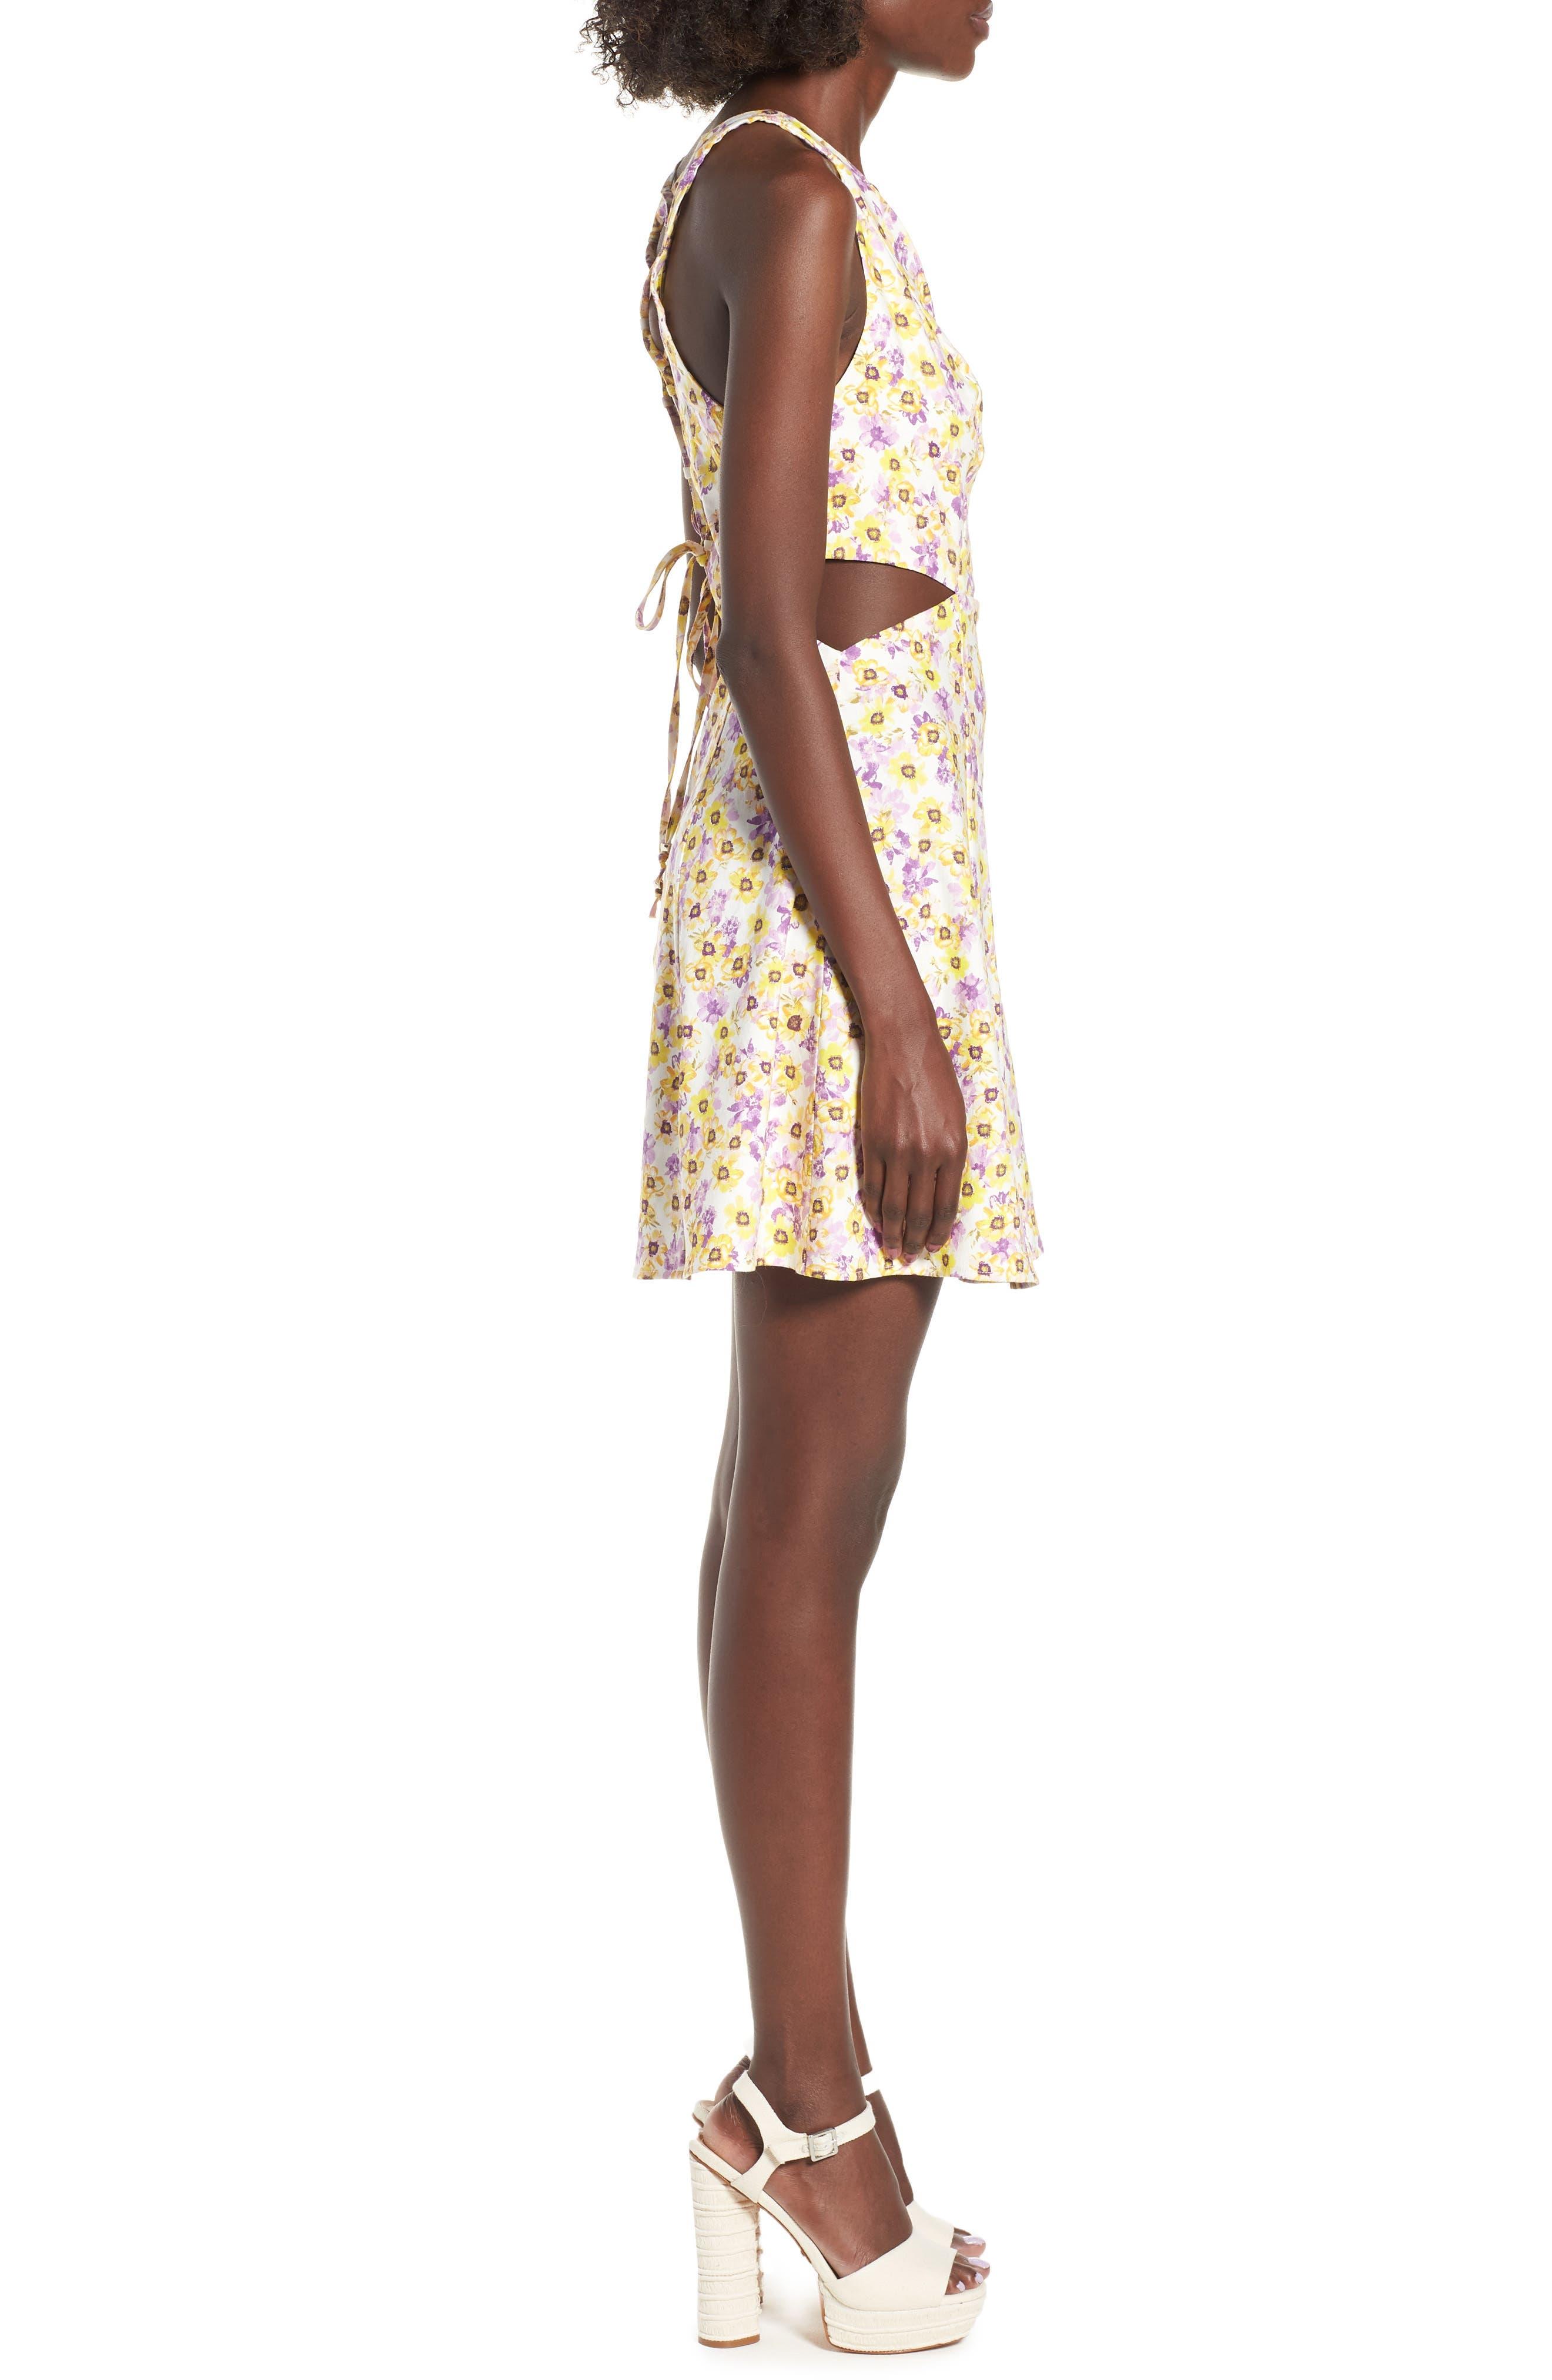 Rayanna Cutout Minidress,                             Alternate thumbnail 3, color,                             Yellow Garden